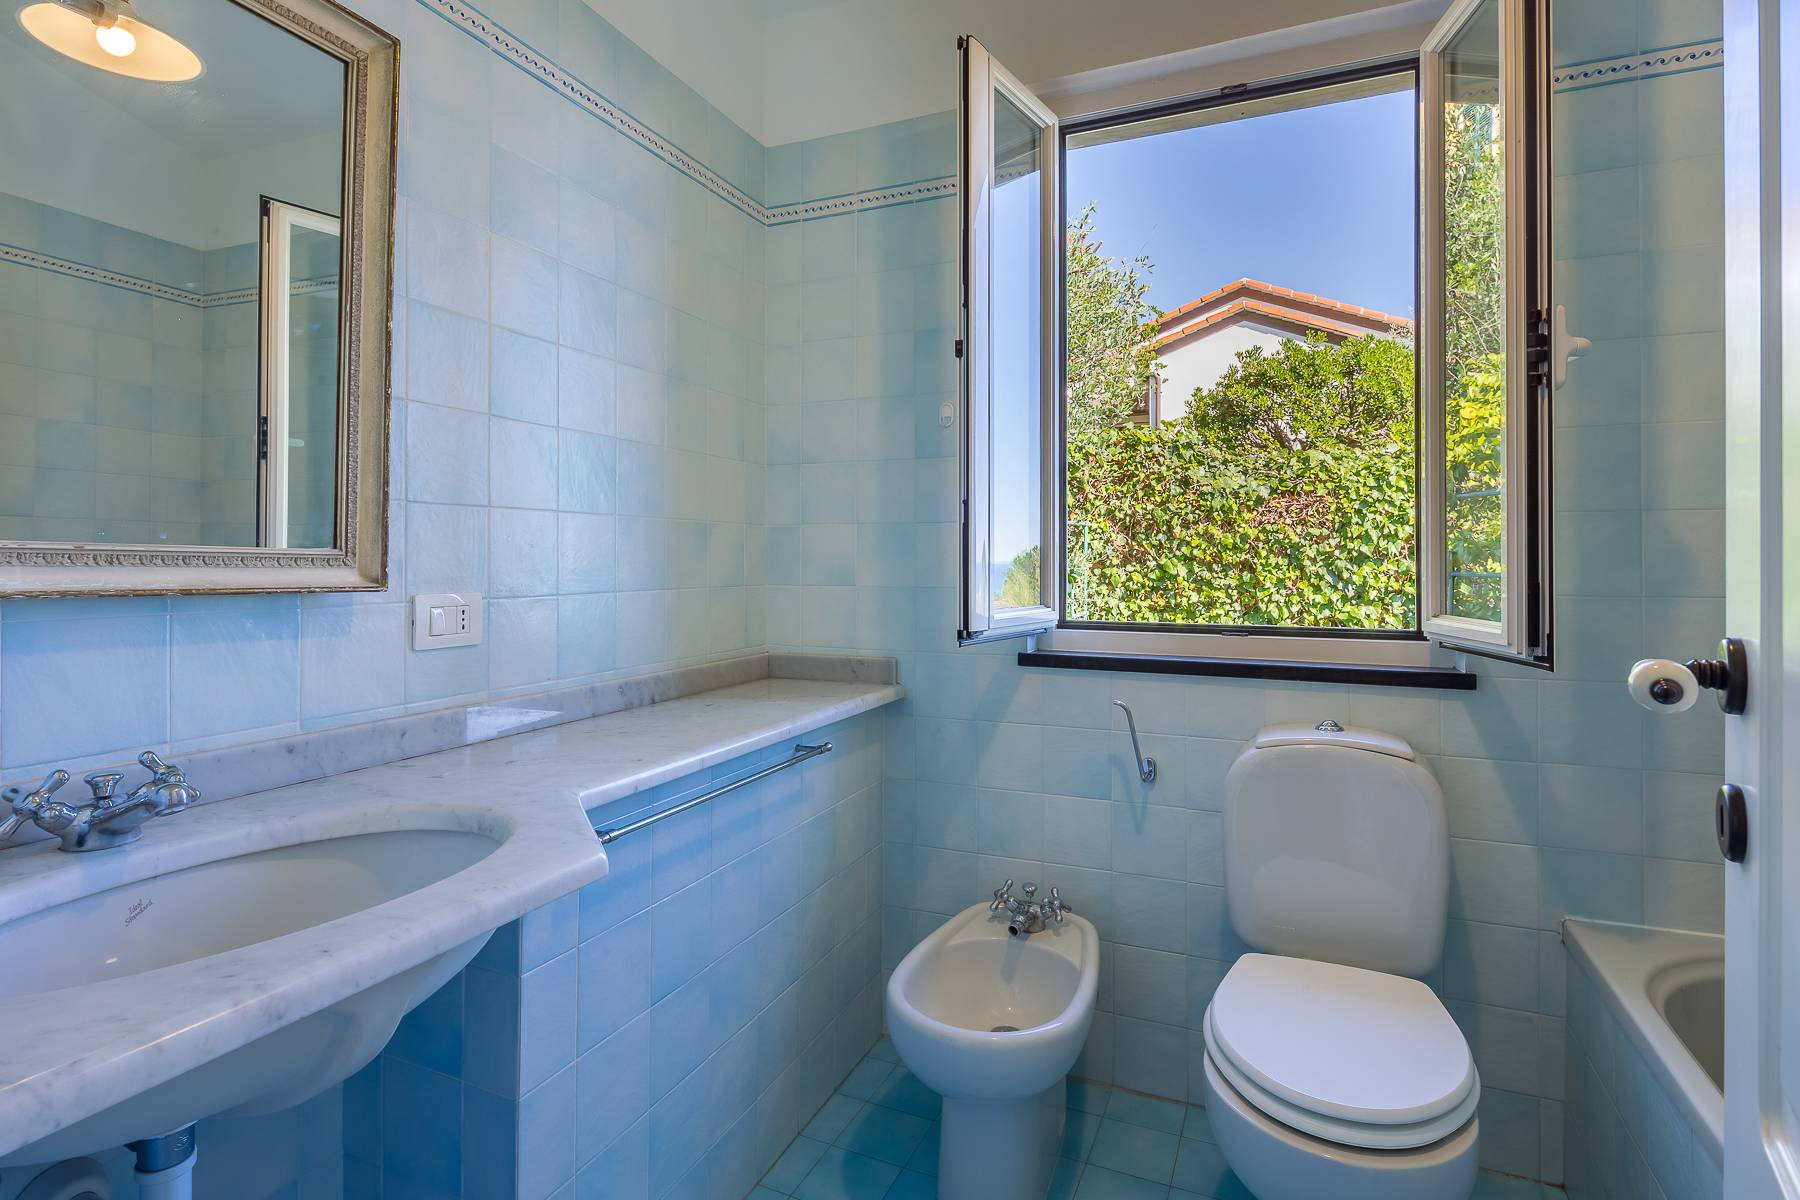 Casa indipendente in Vendita a Zoagli: 5 locali, 100 mq - Foto 25